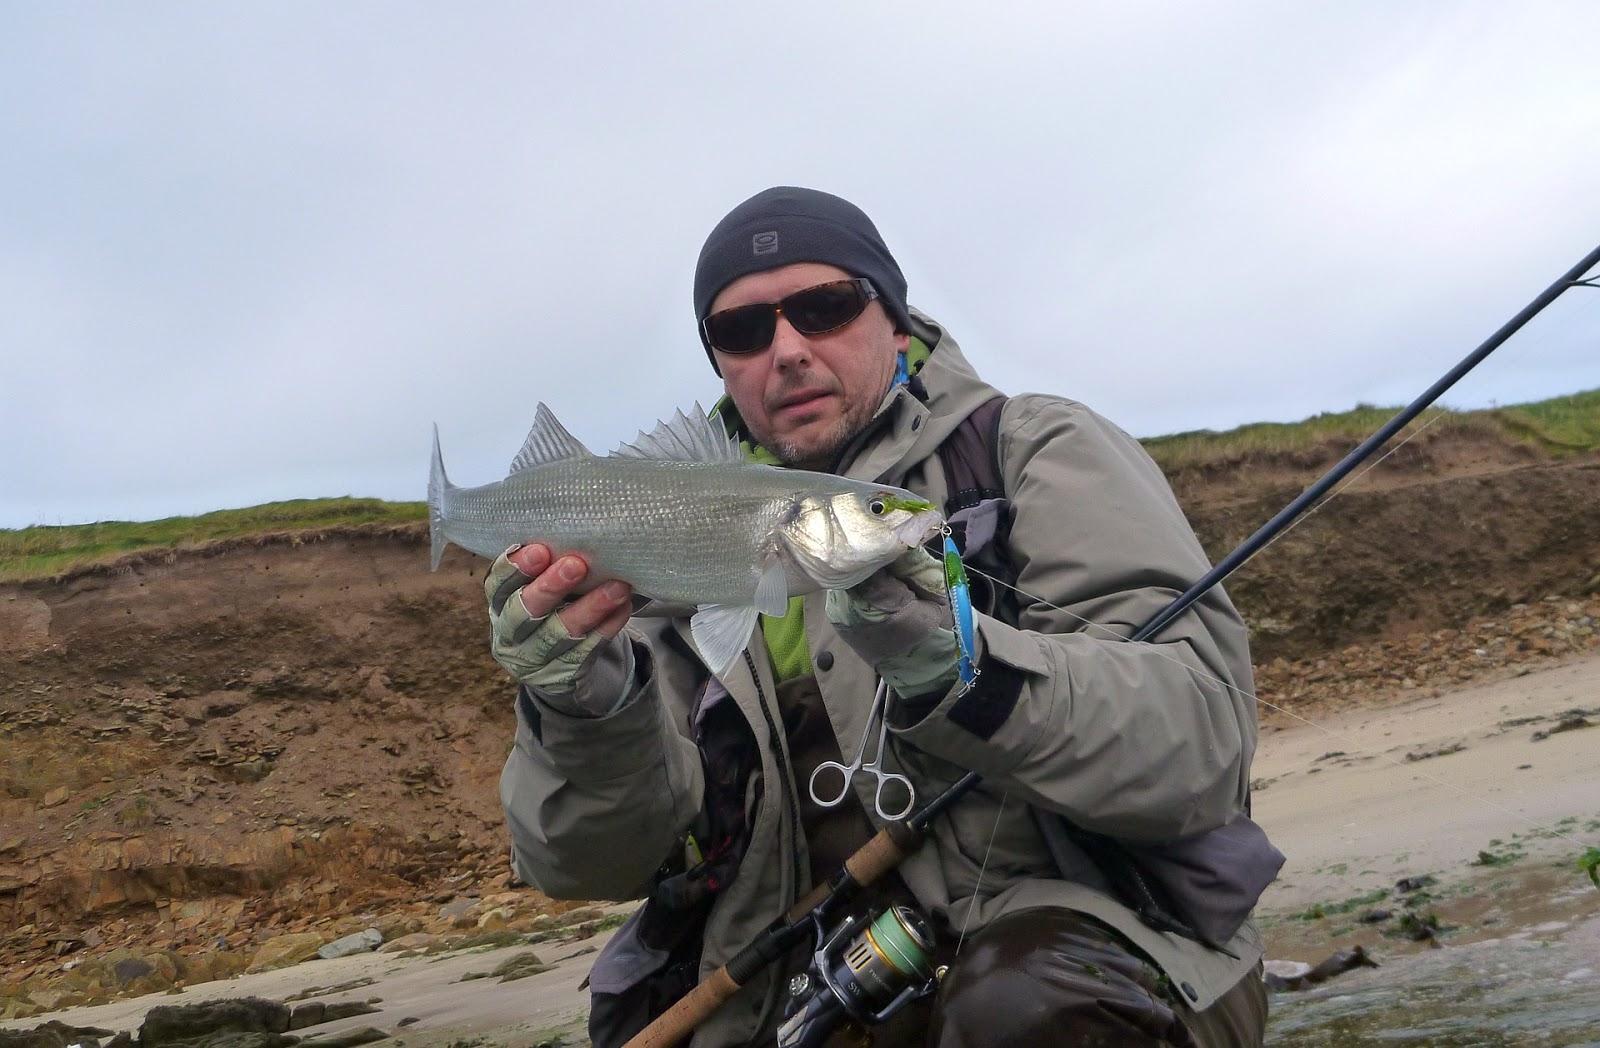 Sea bass hunting amazing end of the sea bass season 2016 for Bass fishing season